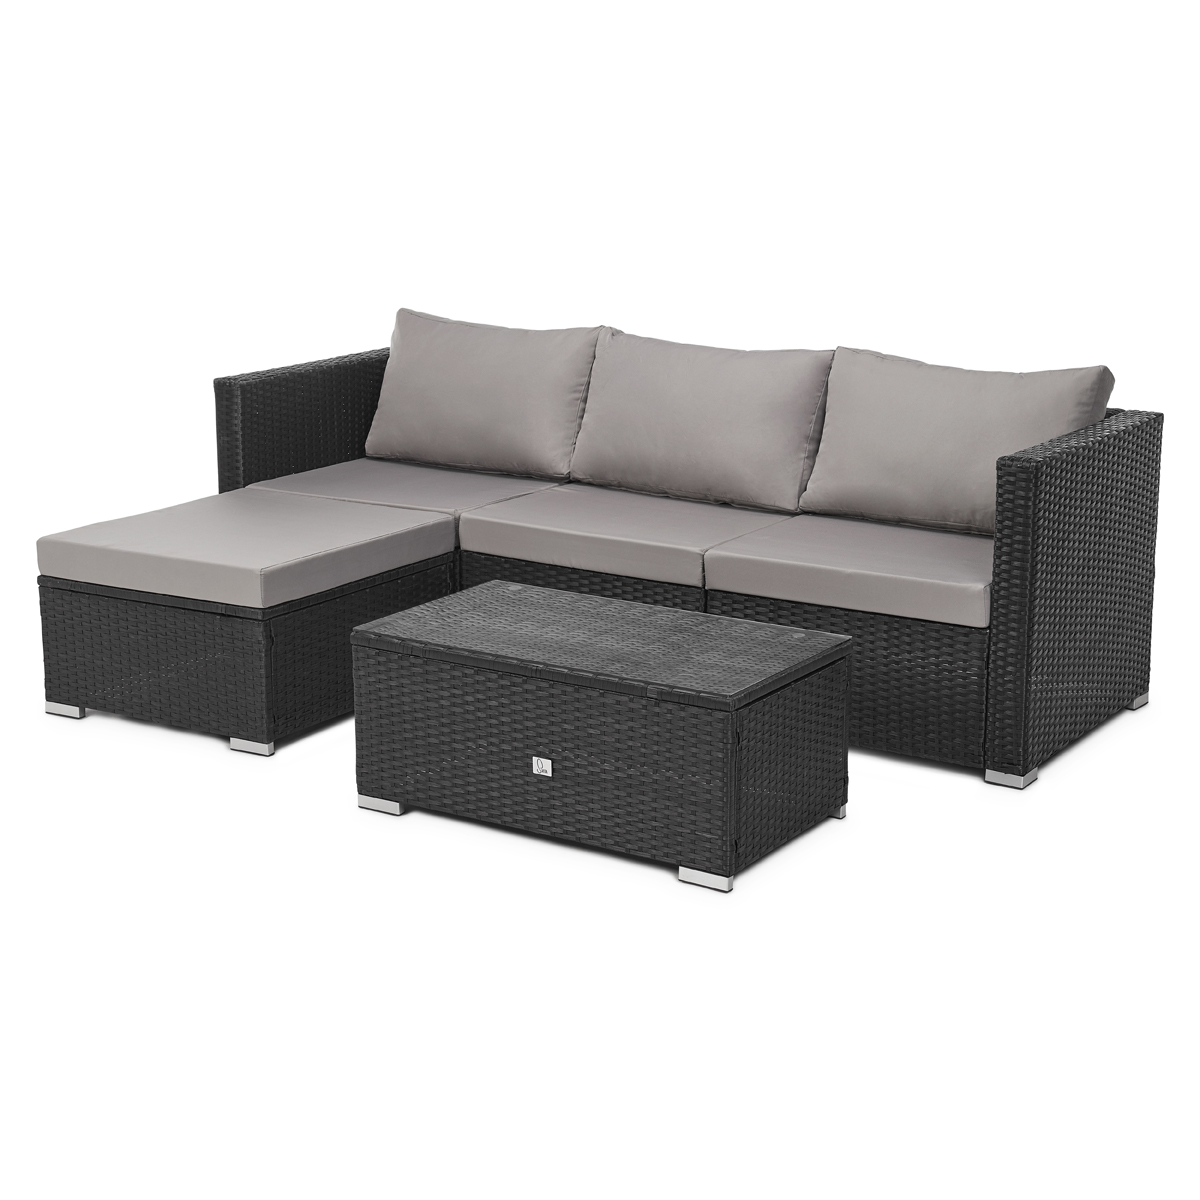 91928 SVITA QUEENS Poly Rattan Lounge Schwarz